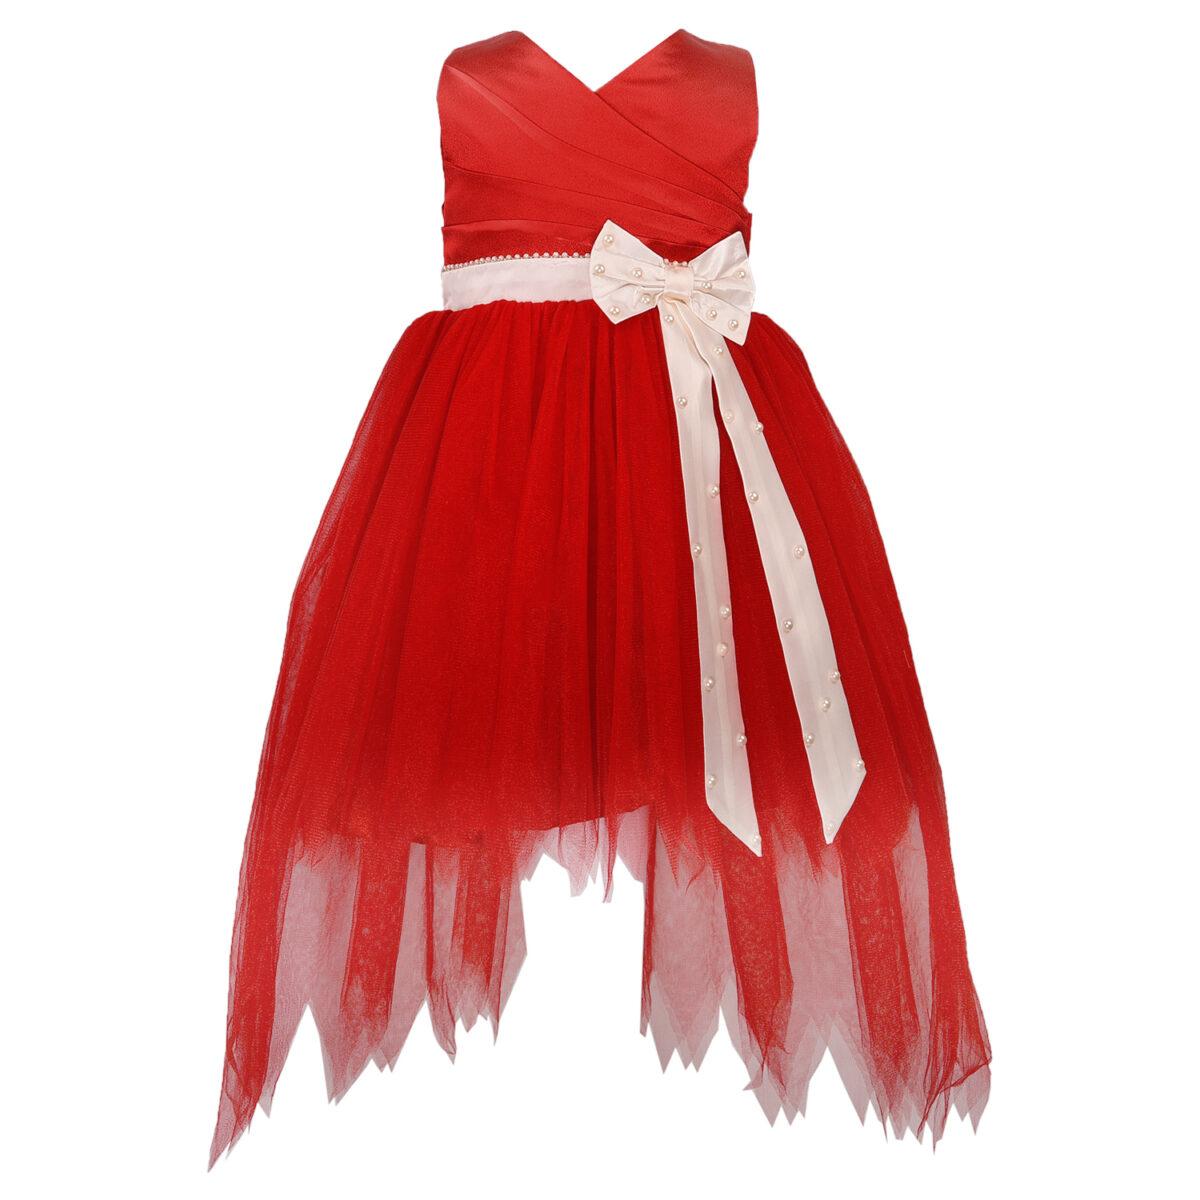 DSC 2824 copy TBT High-Low Bow Dress